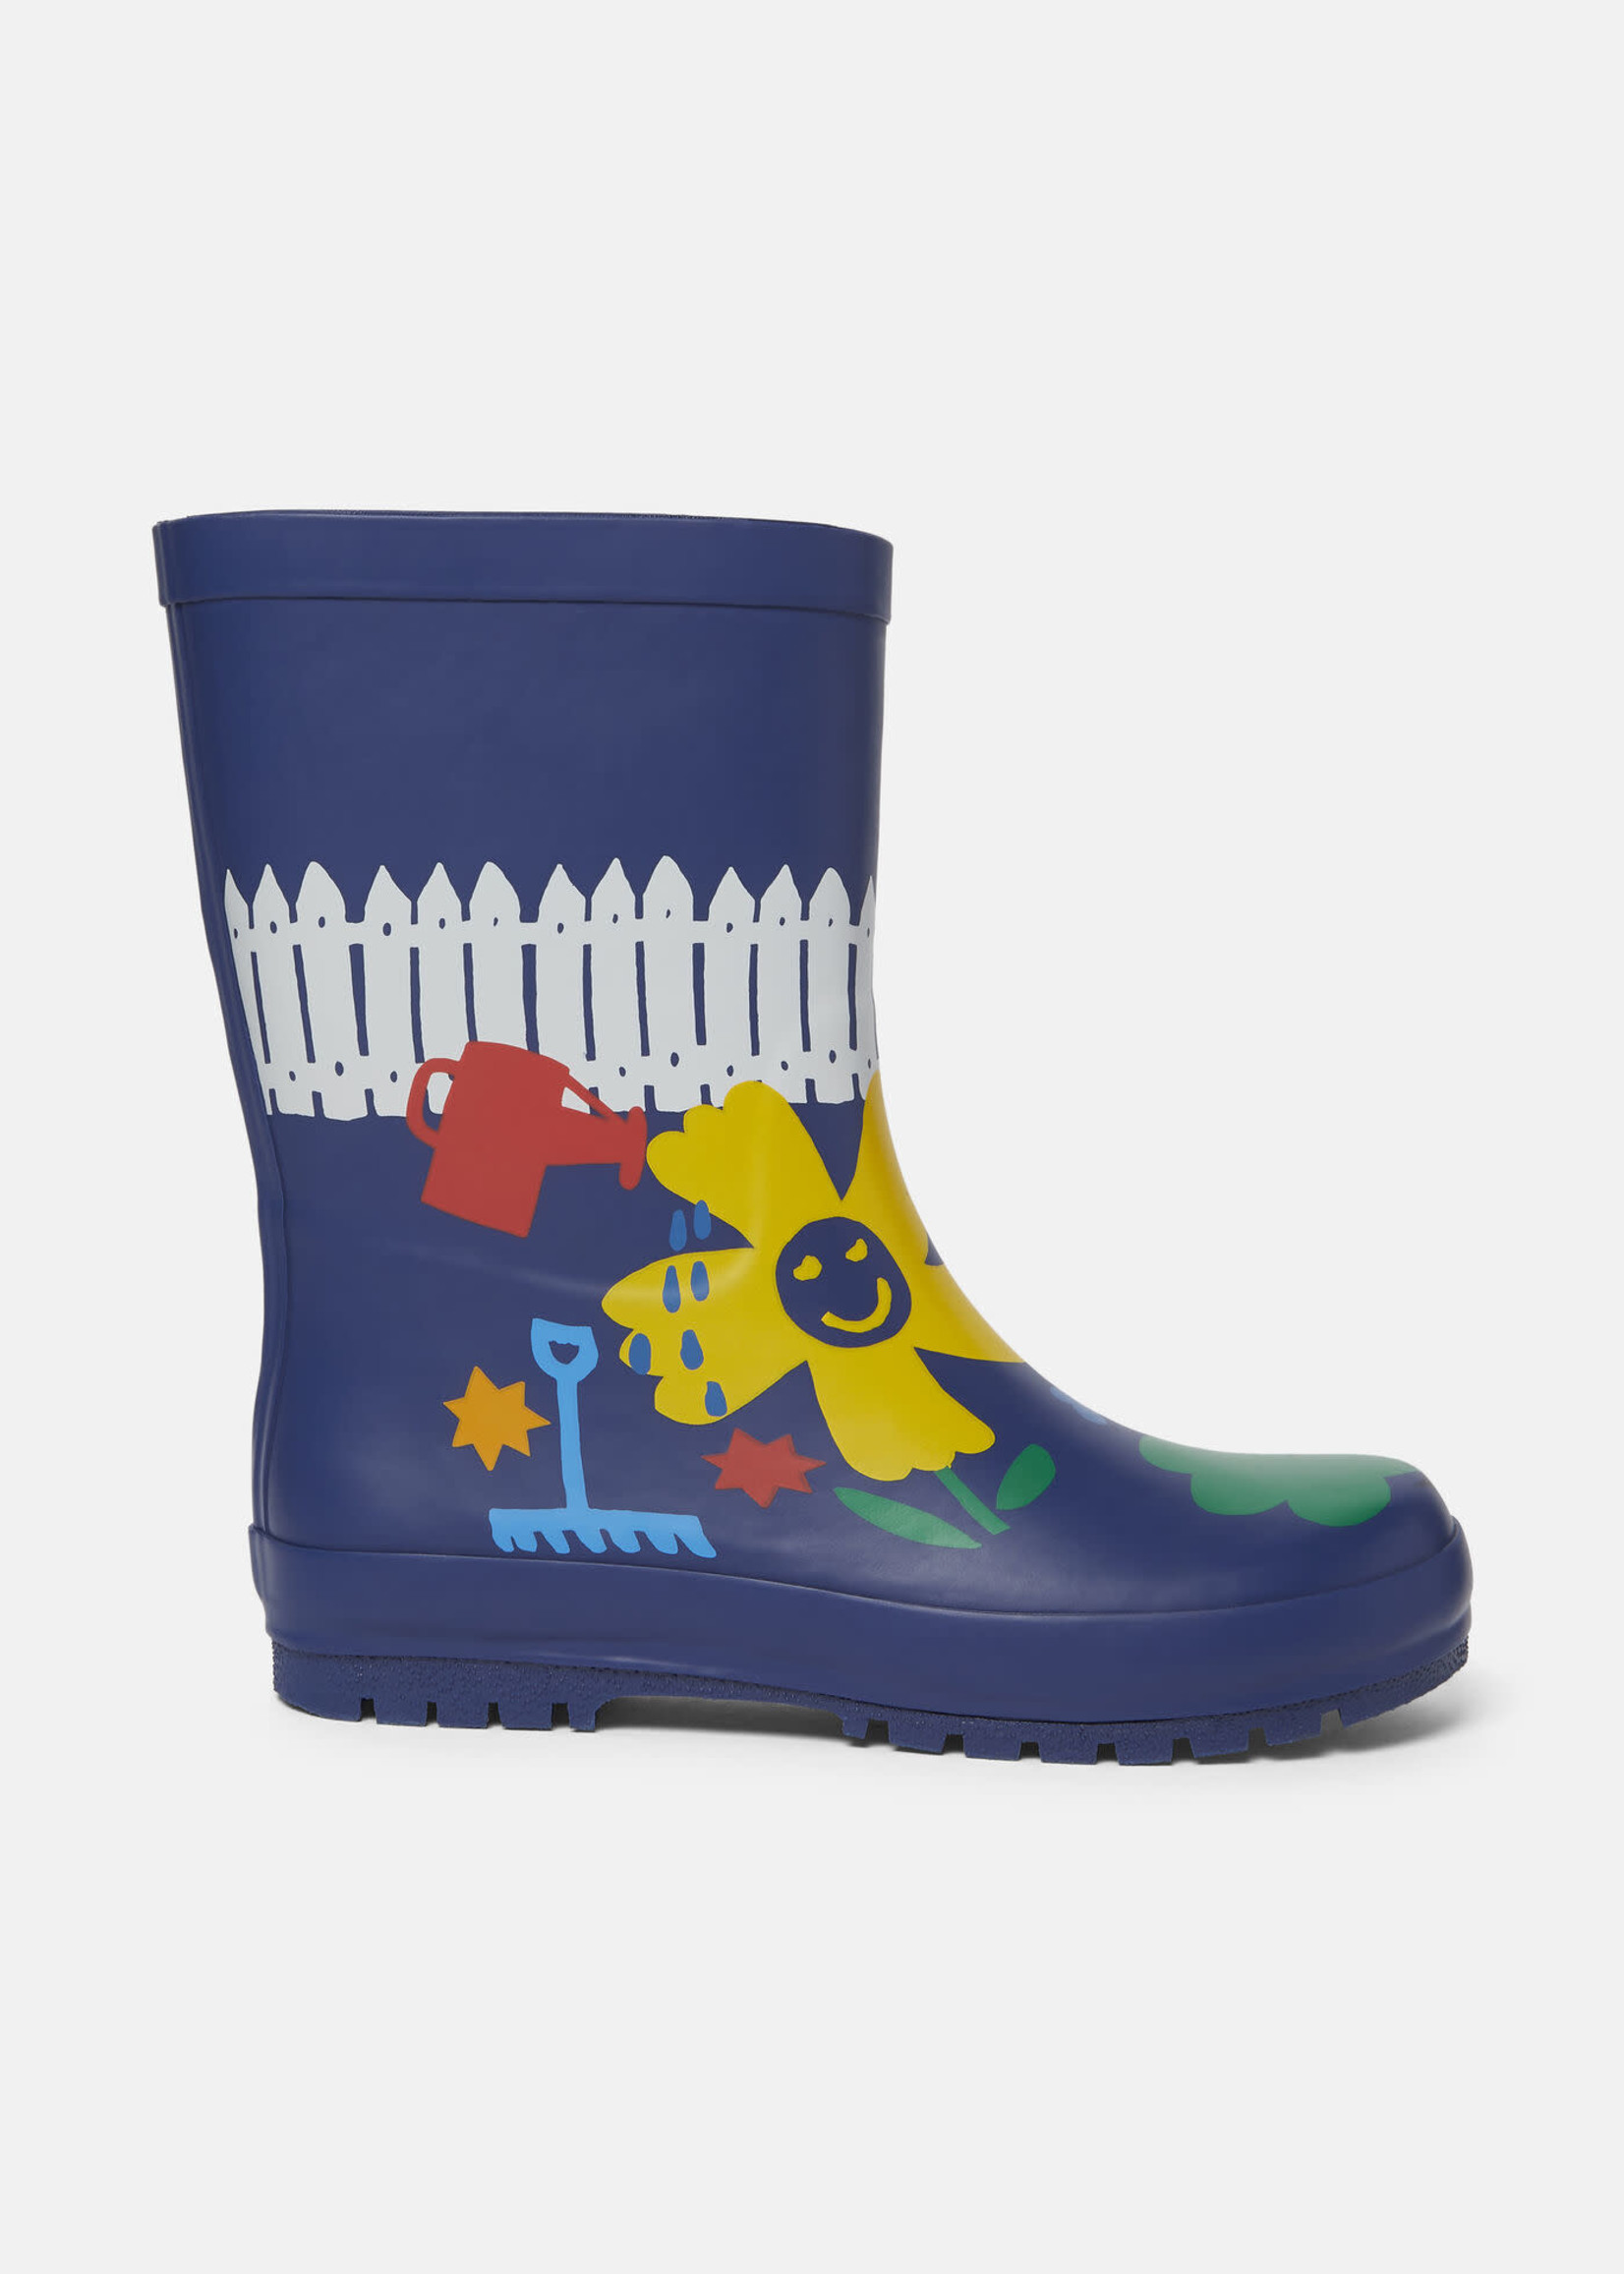 Stella McCartney Stella Mccartney-AW21 603399 Gardening Waterproof Rainboots